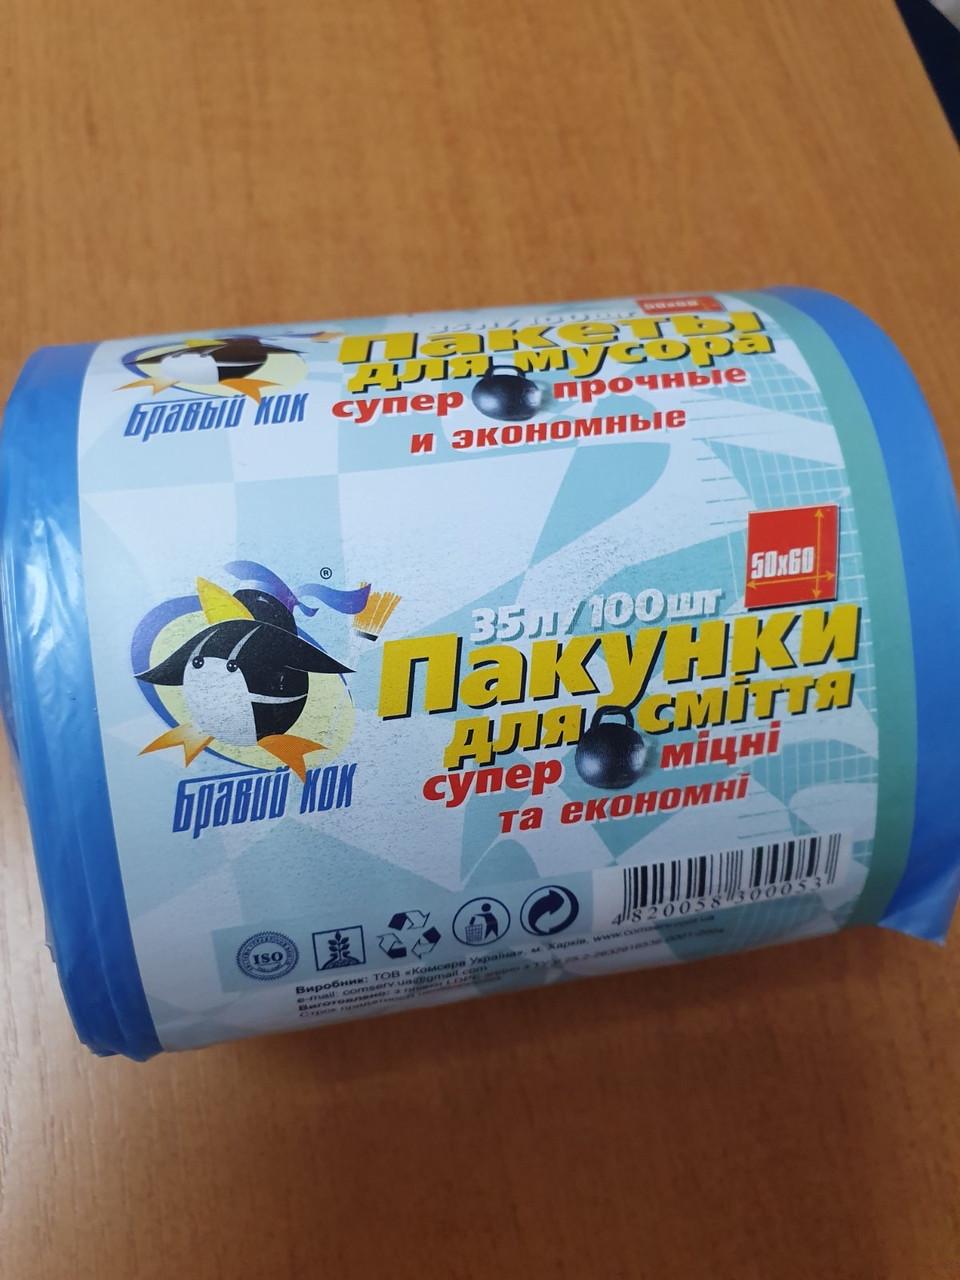 Сміттєвий пакет 35л/100 шт суперміцні 50*60 см